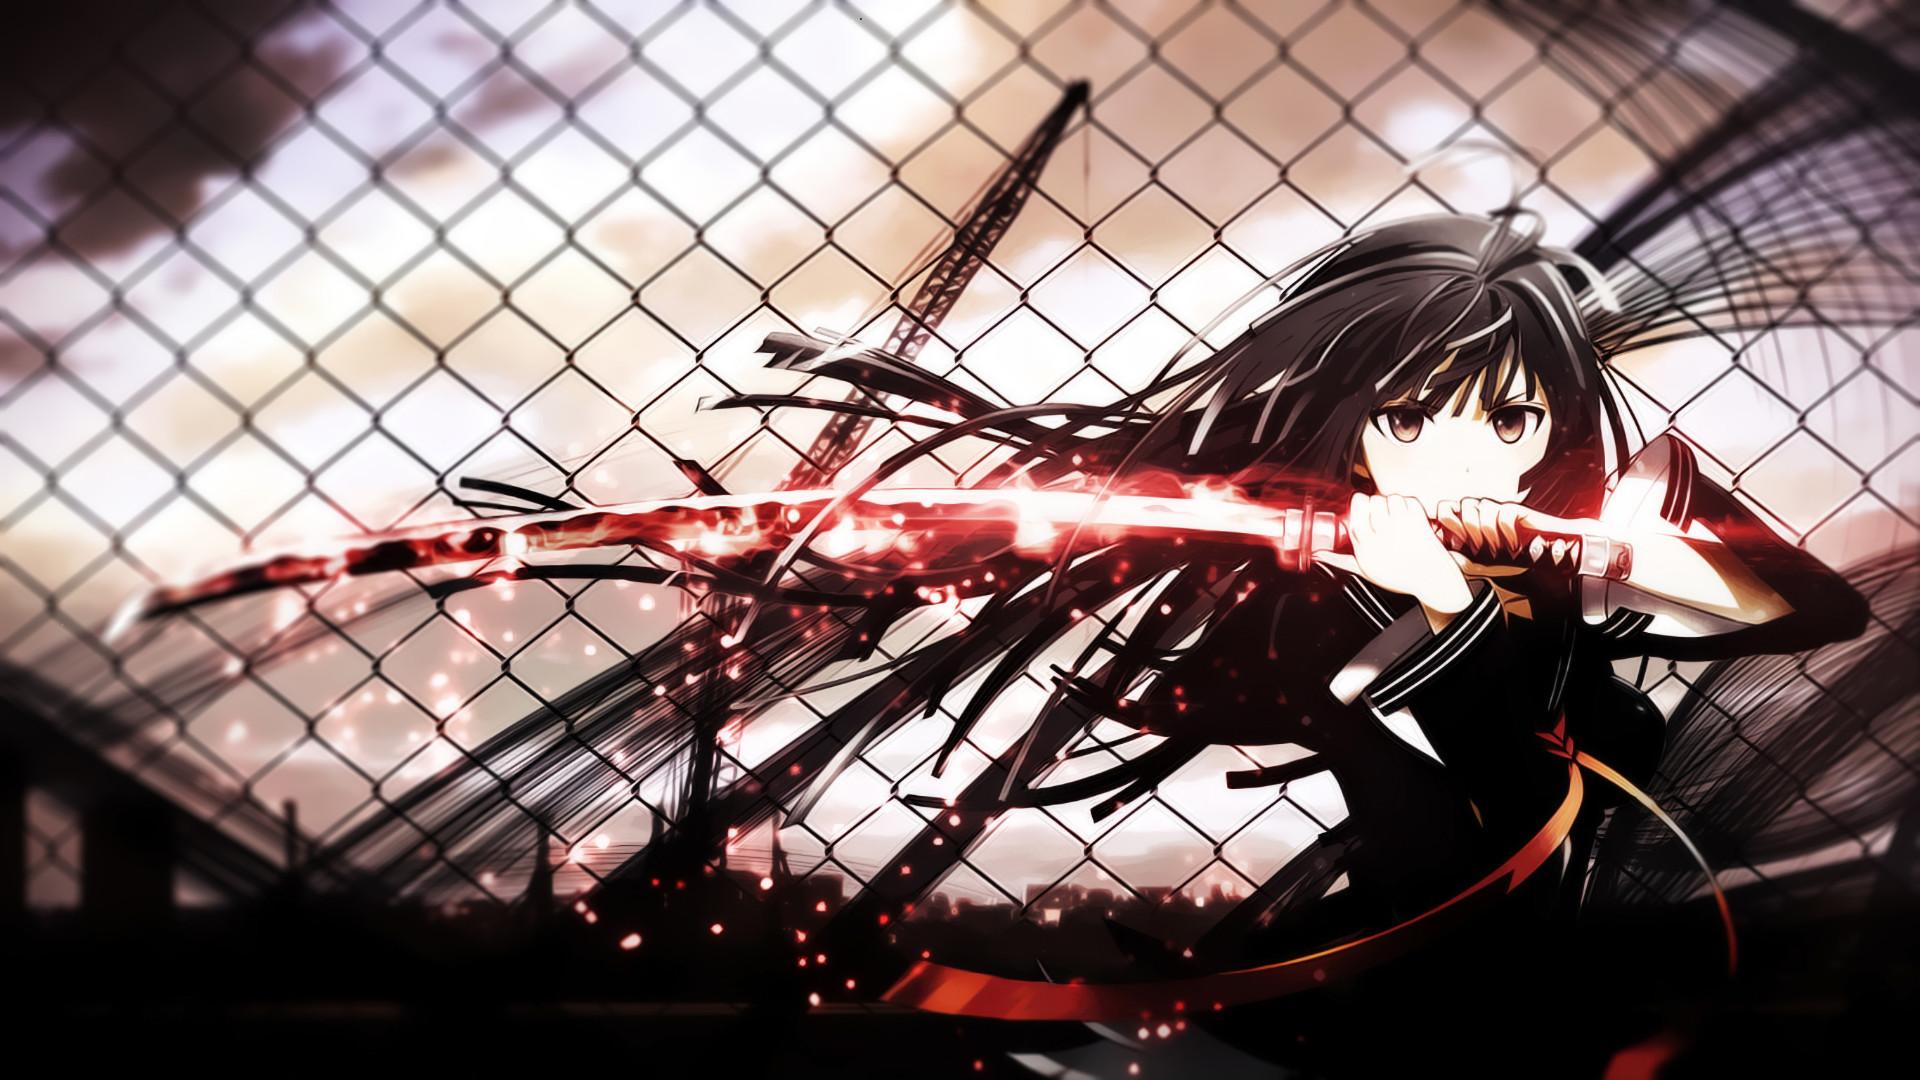 Anime Wallpaper Aoki Hagane no Arpeggio, Kisara Tendo, Black  Bullet, sword